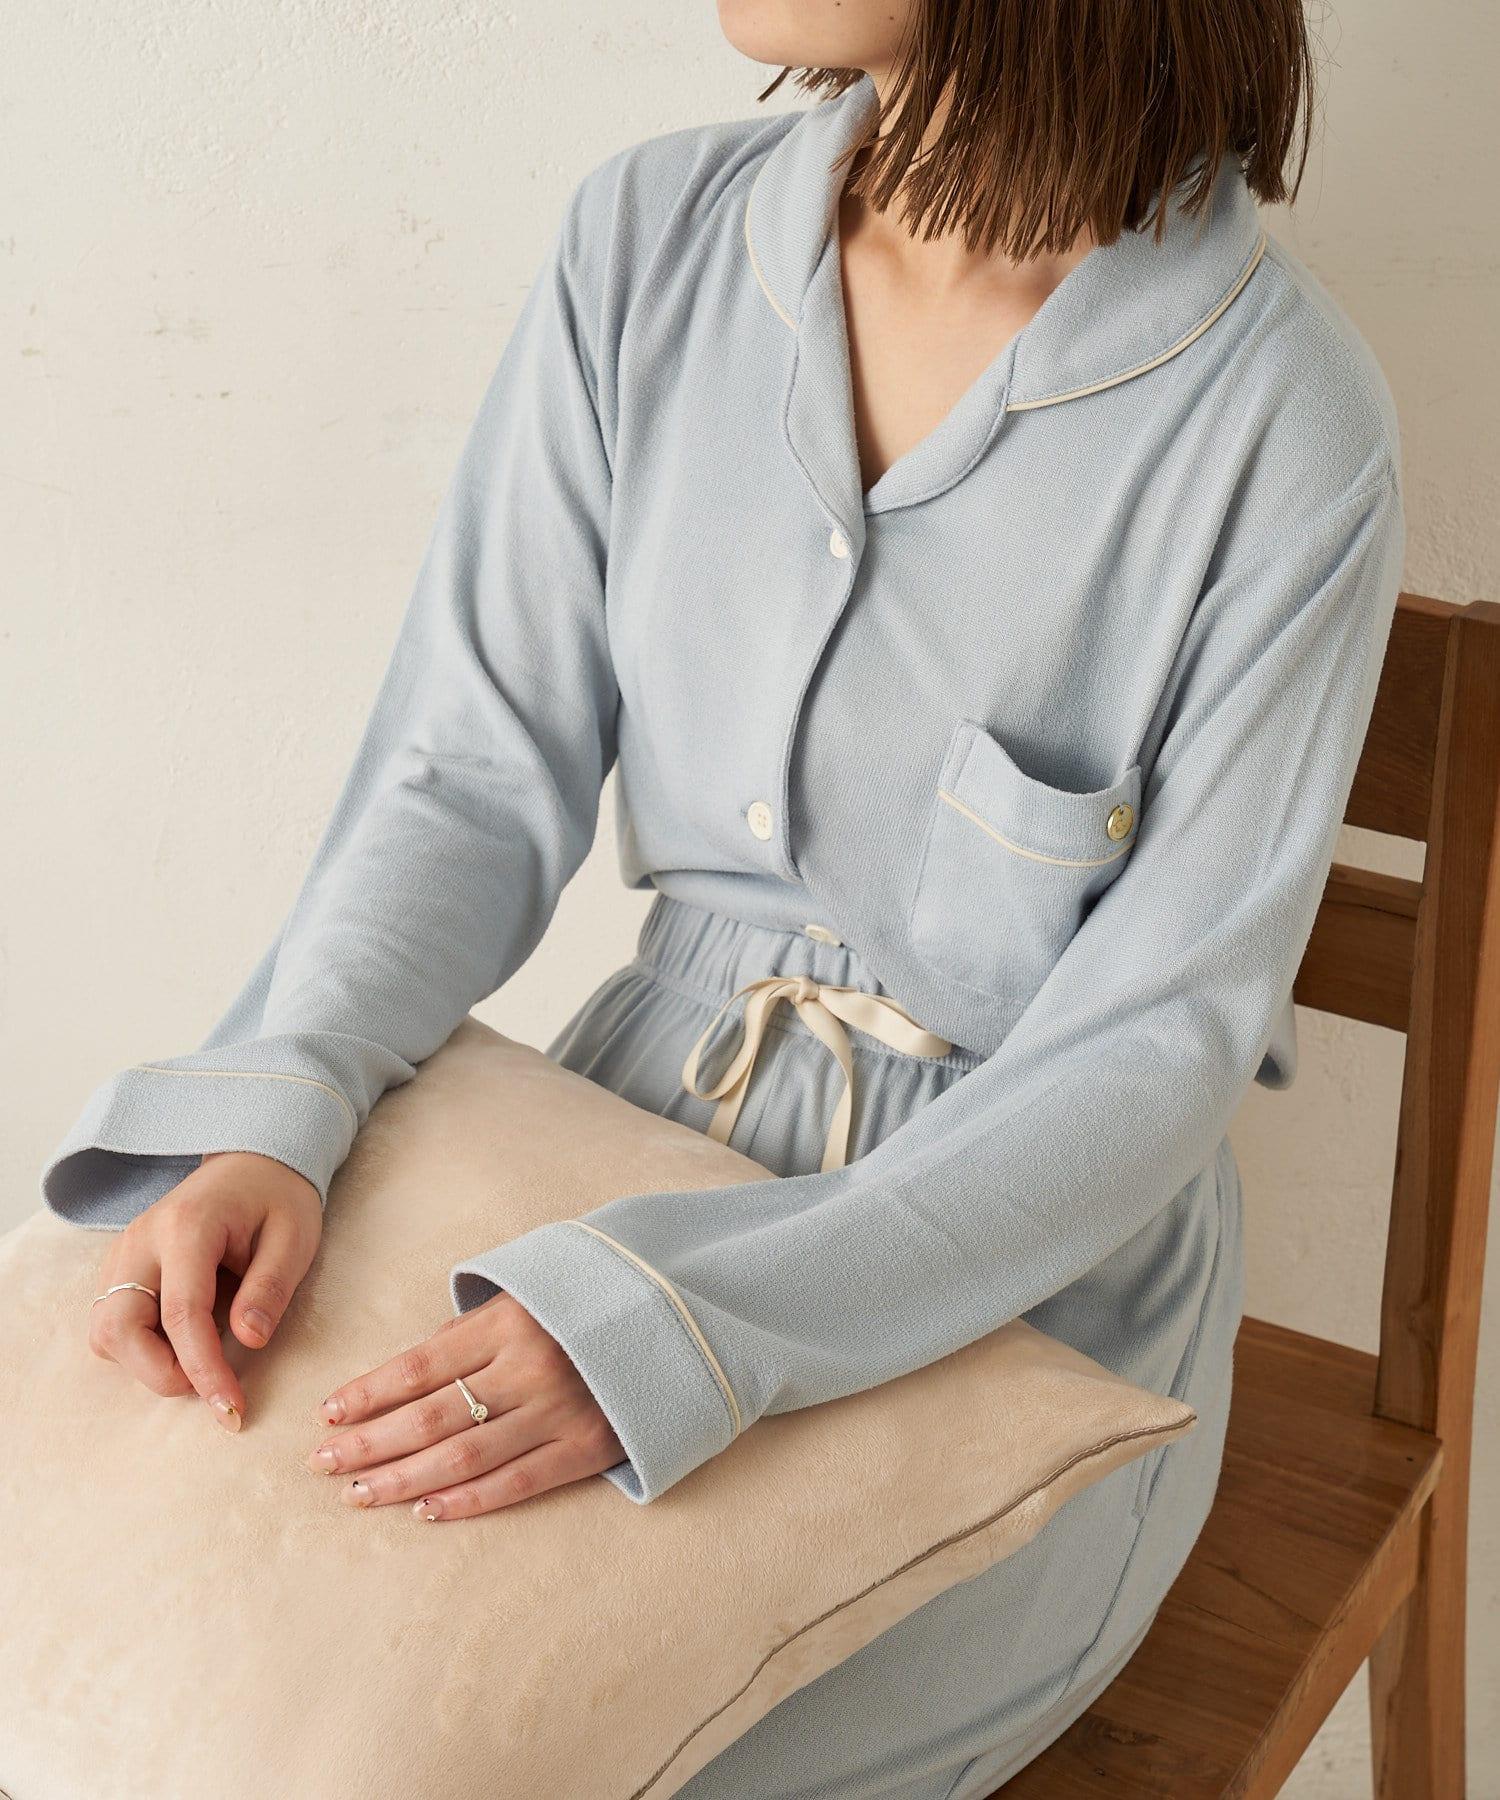 TERRITOIRE(テリトワール) ホイップニットパジャマ 上下セット